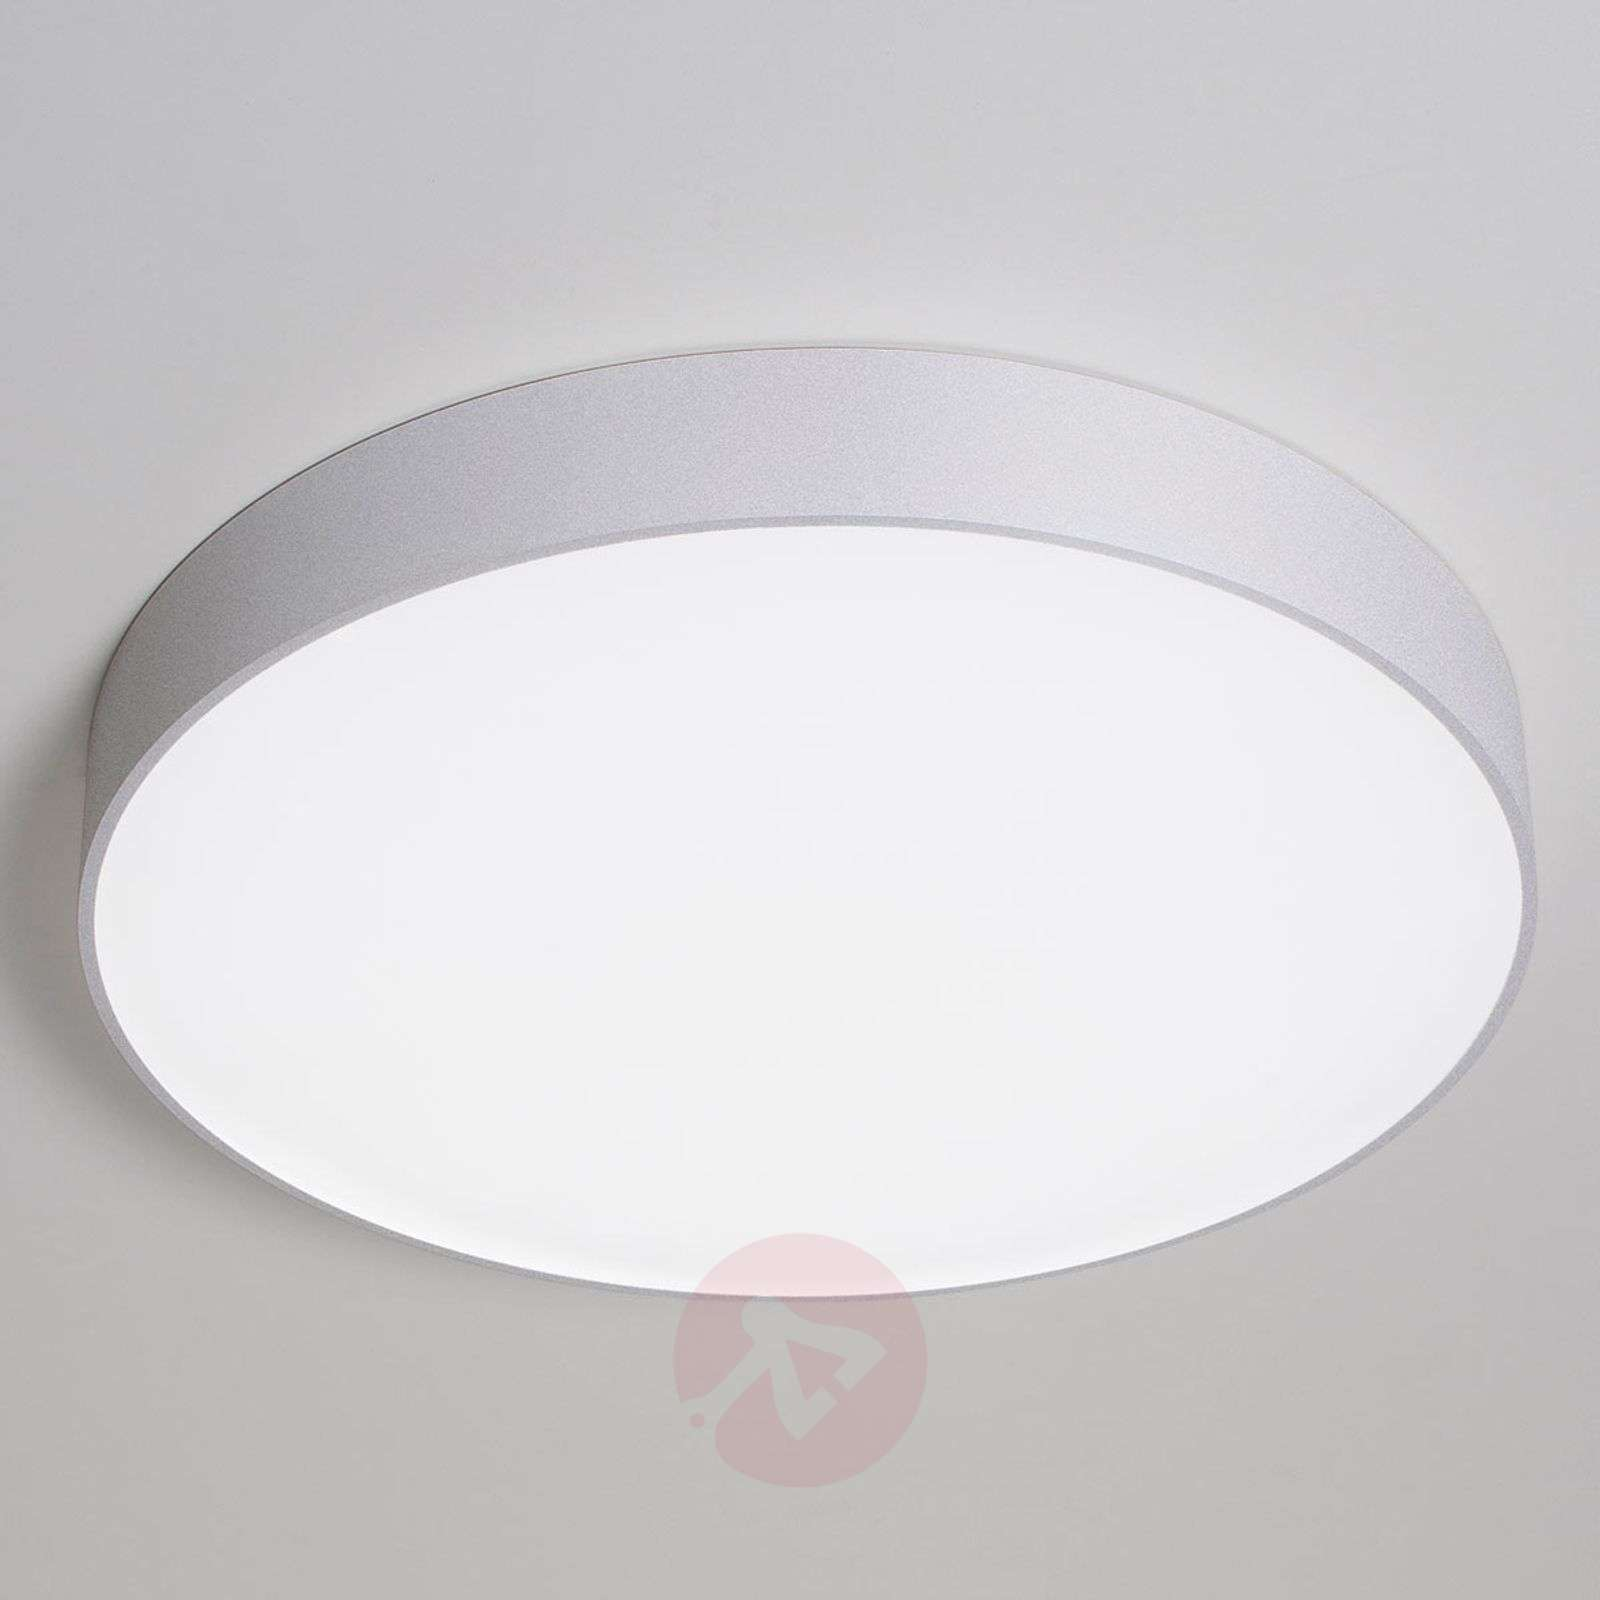 Iso LED-kattovalaisin Bado SD 60 cm, hopea 4000K-6523799-01